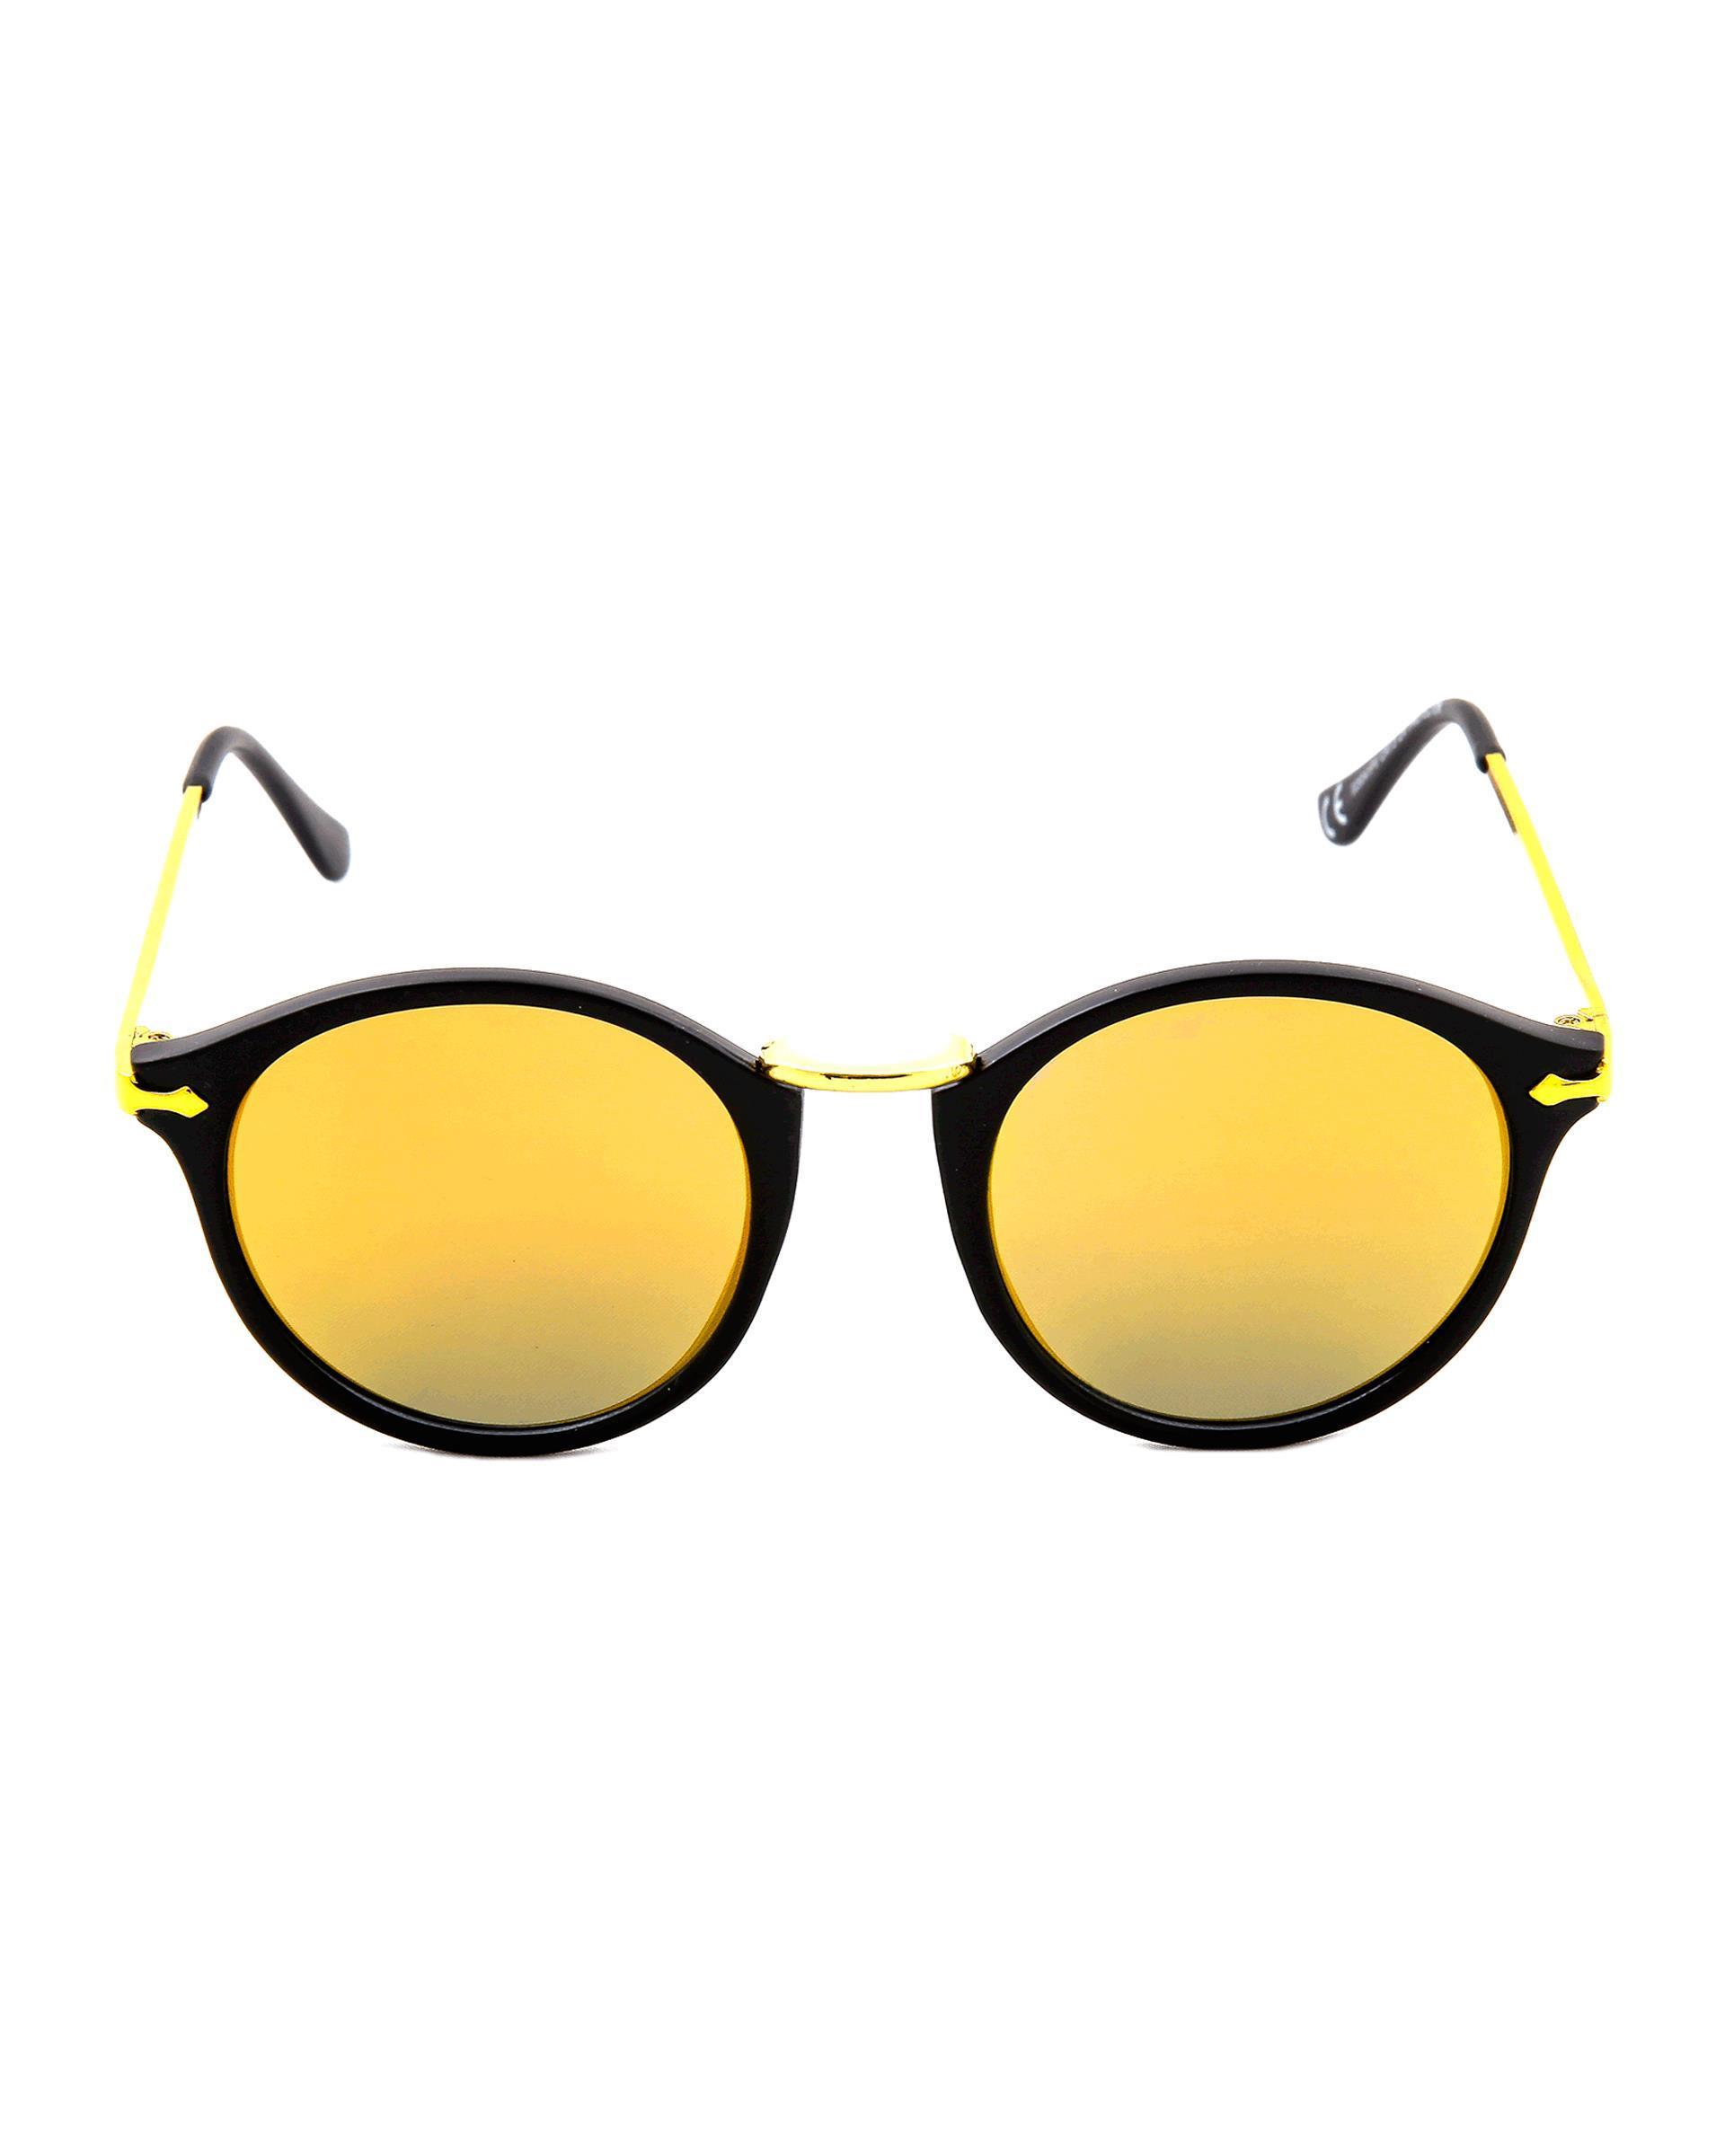 عینک آفتابی مشکی زرد Enrique